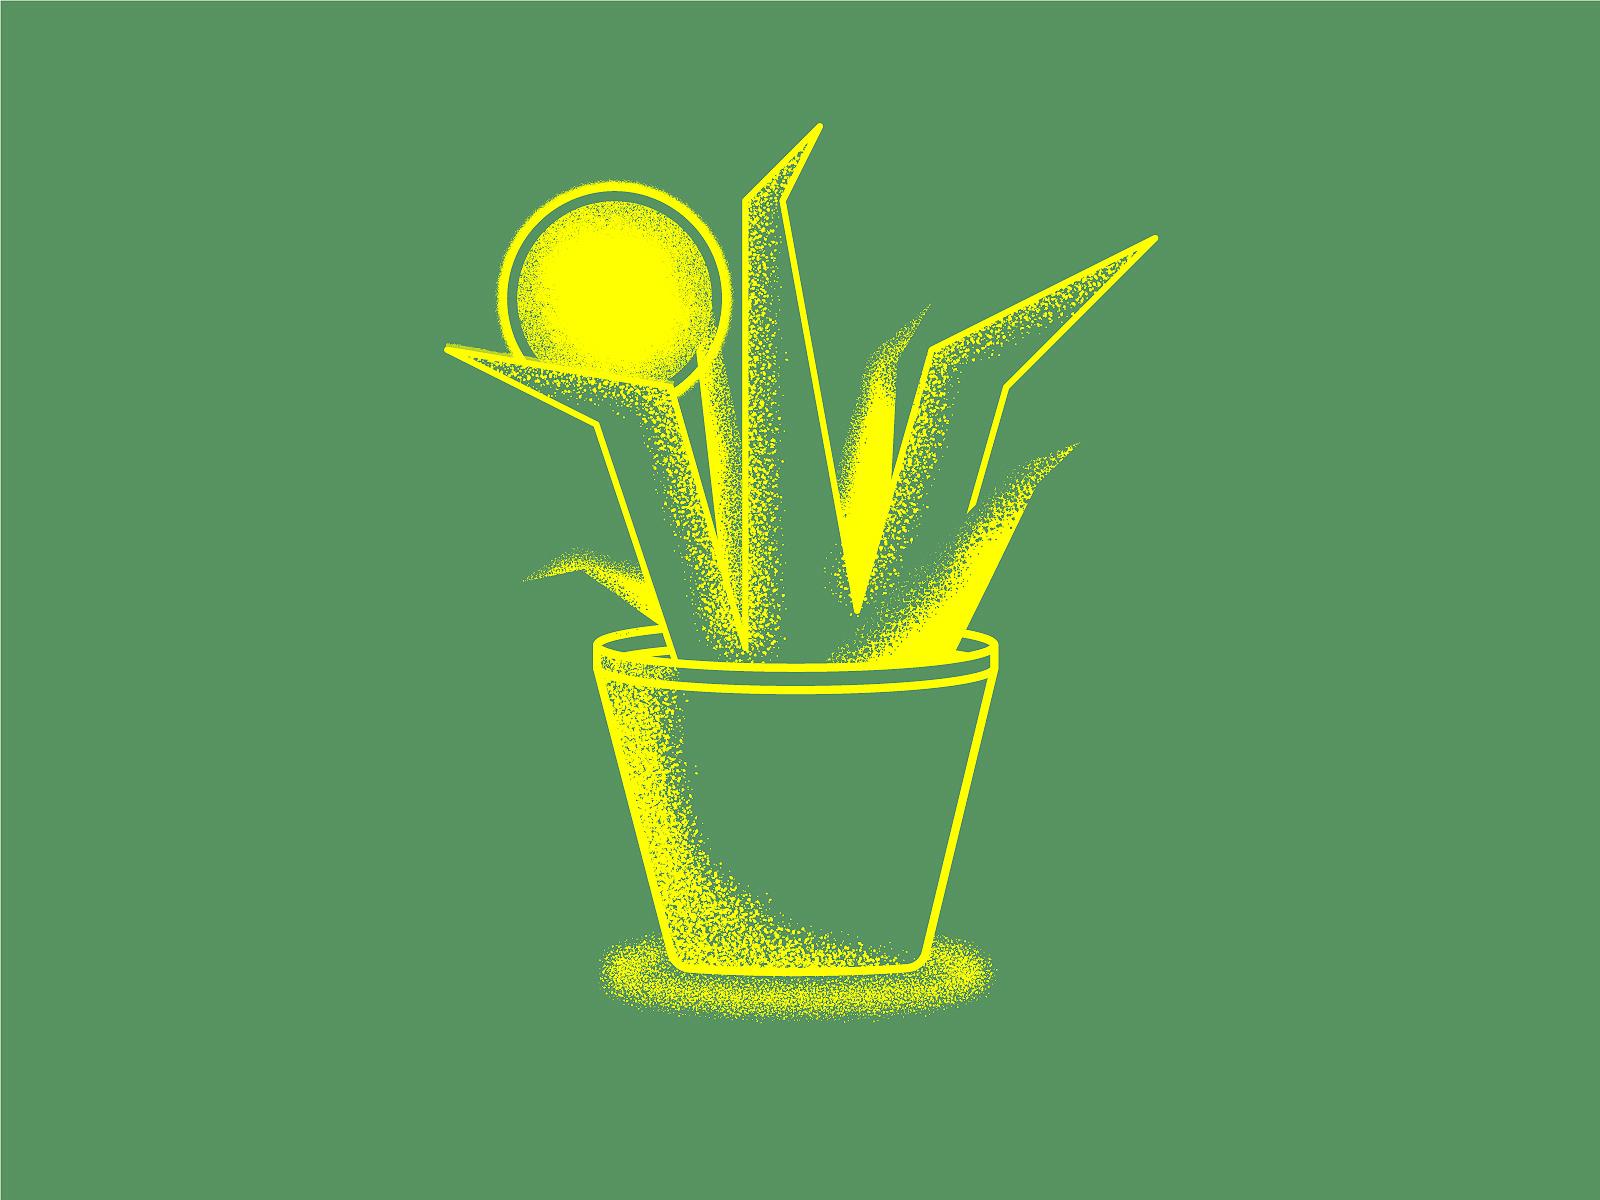 Green plant dribbble 03 19 19